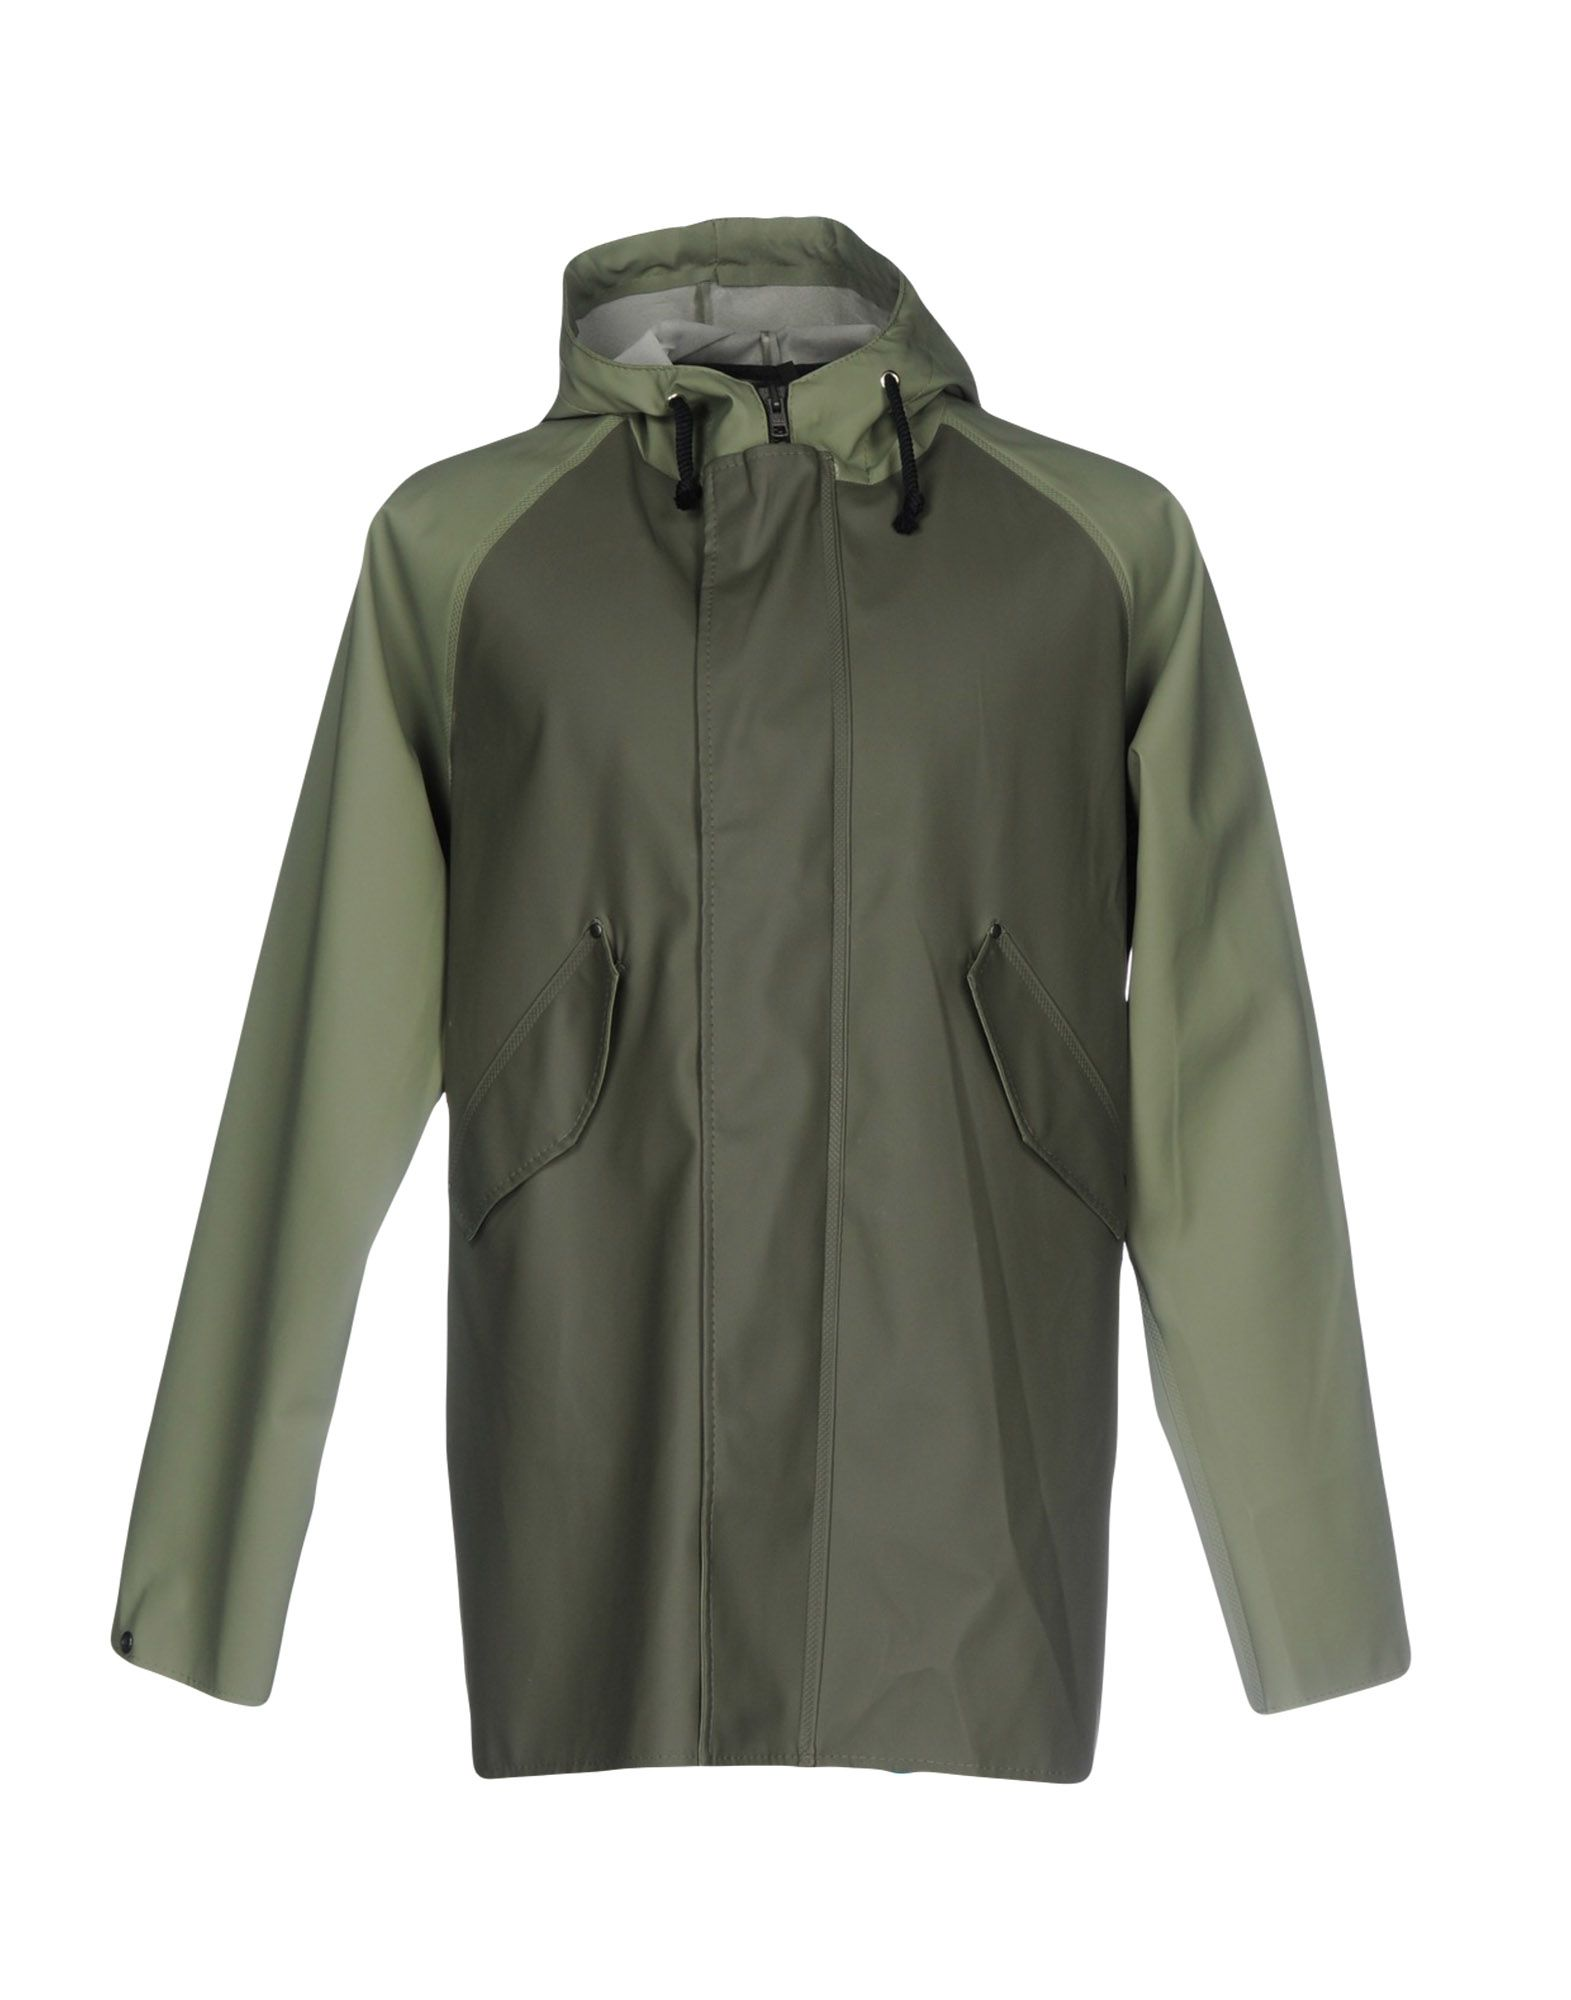 ELKA Full-Length Jacket in Military Green